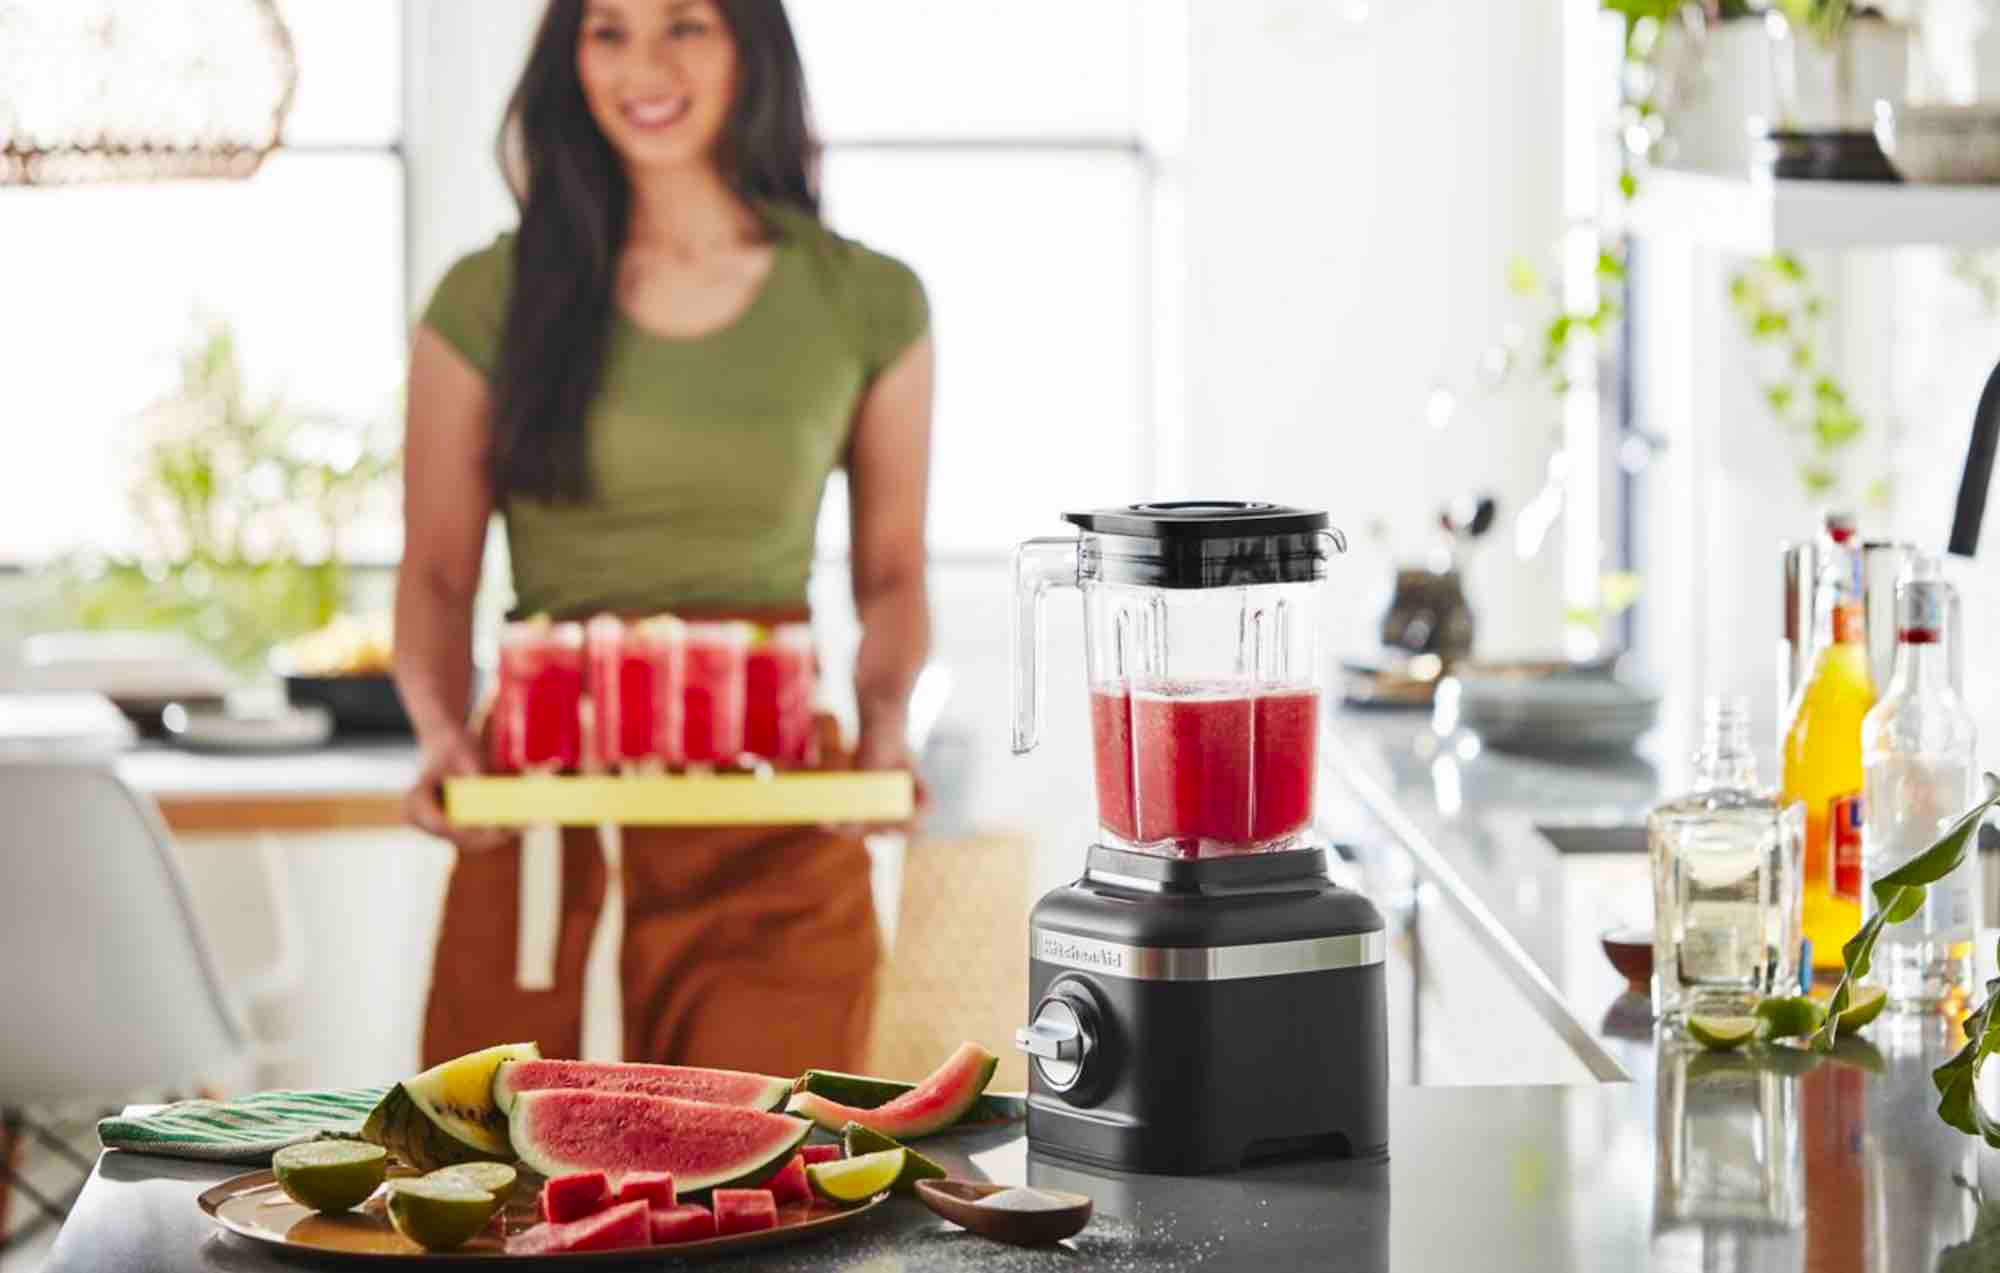 KitchenAid blender healthy eating